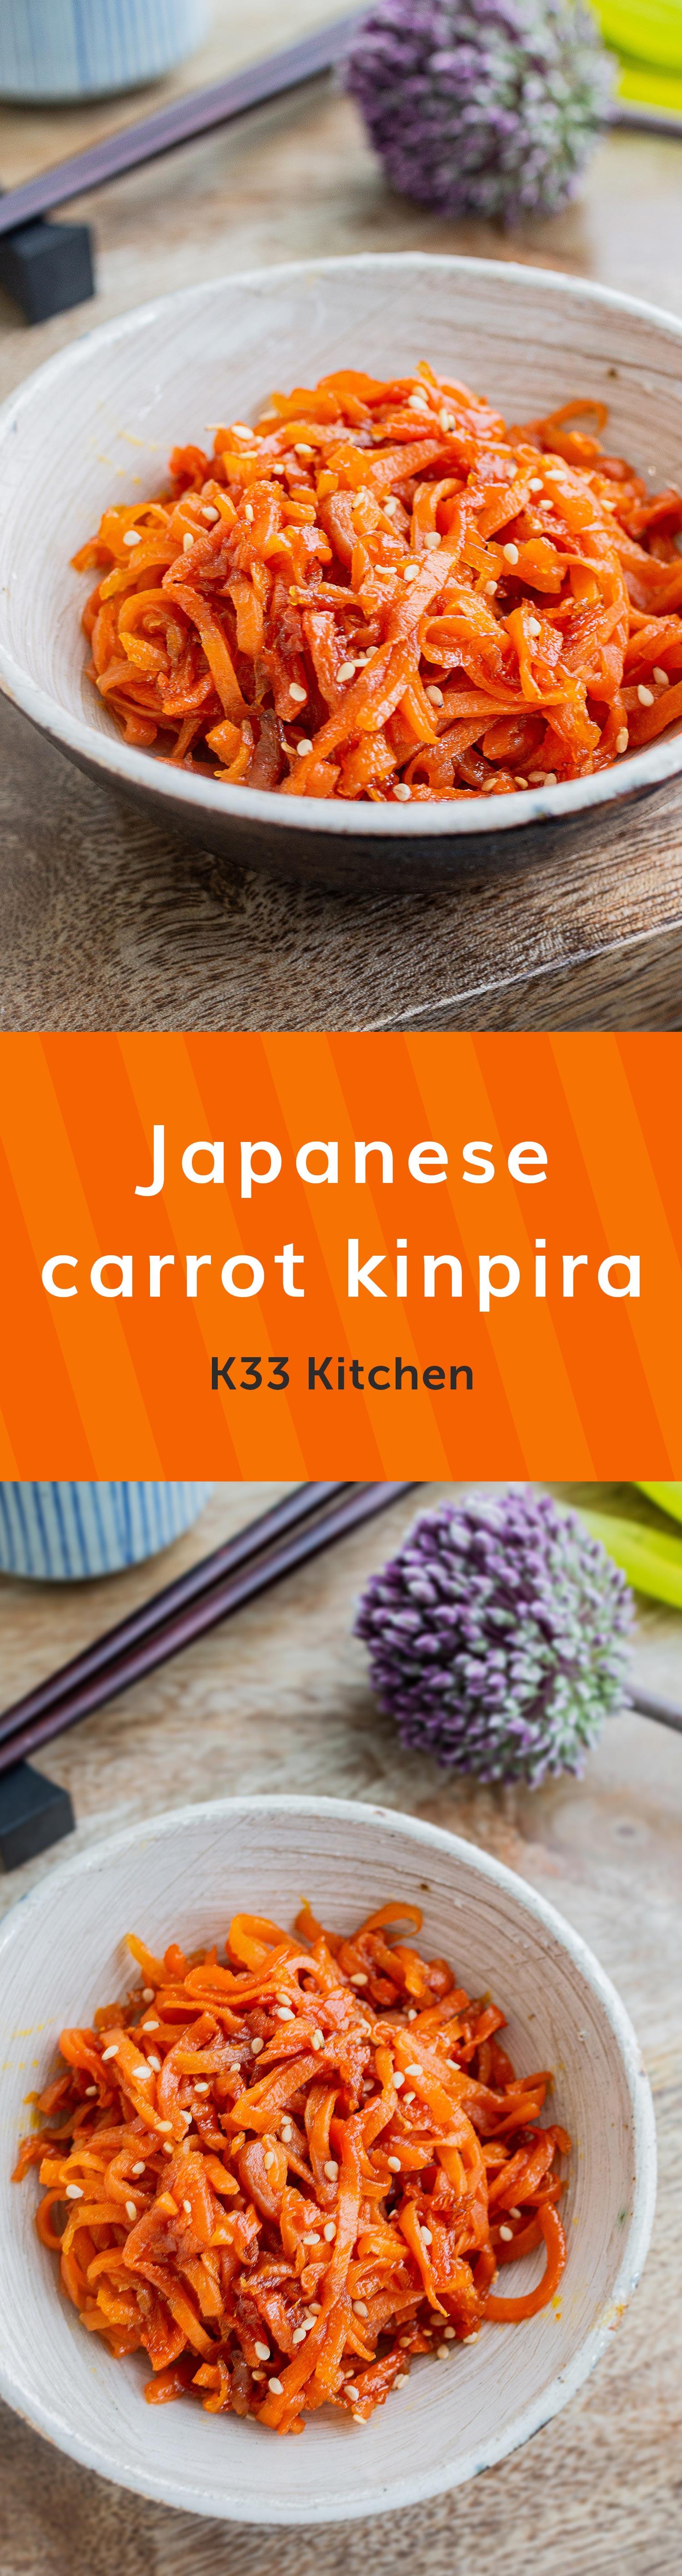 Japanese carrot kinpira – K33 Kitchen